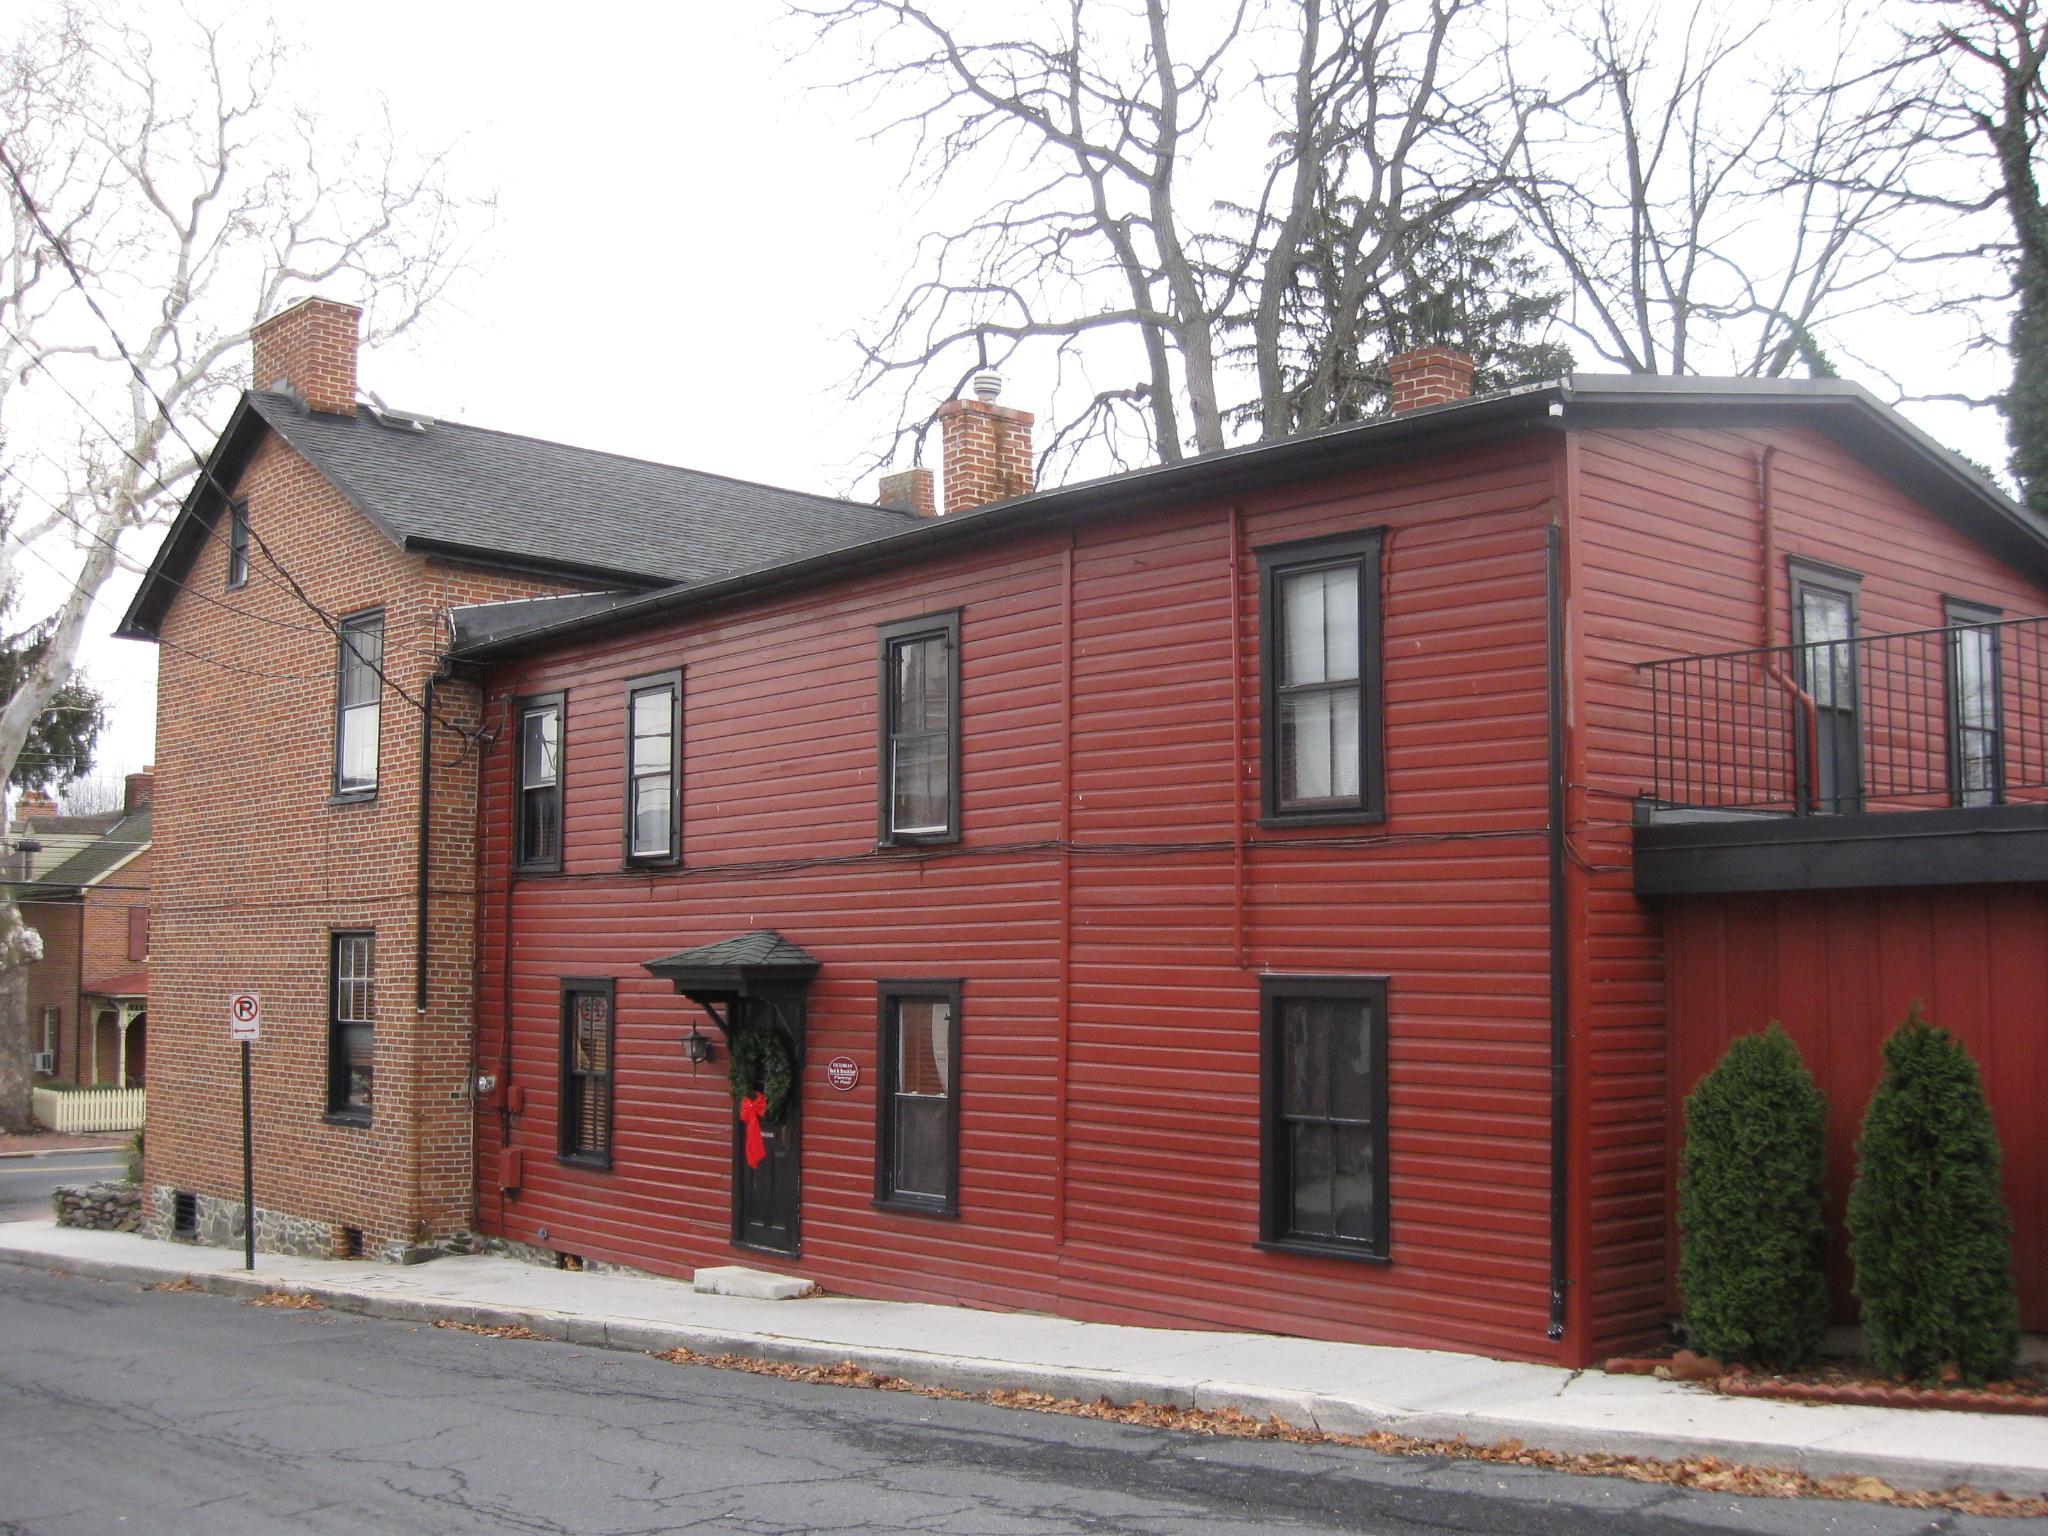 sweney house (farnsworth house) christmas decorations   gettysburg